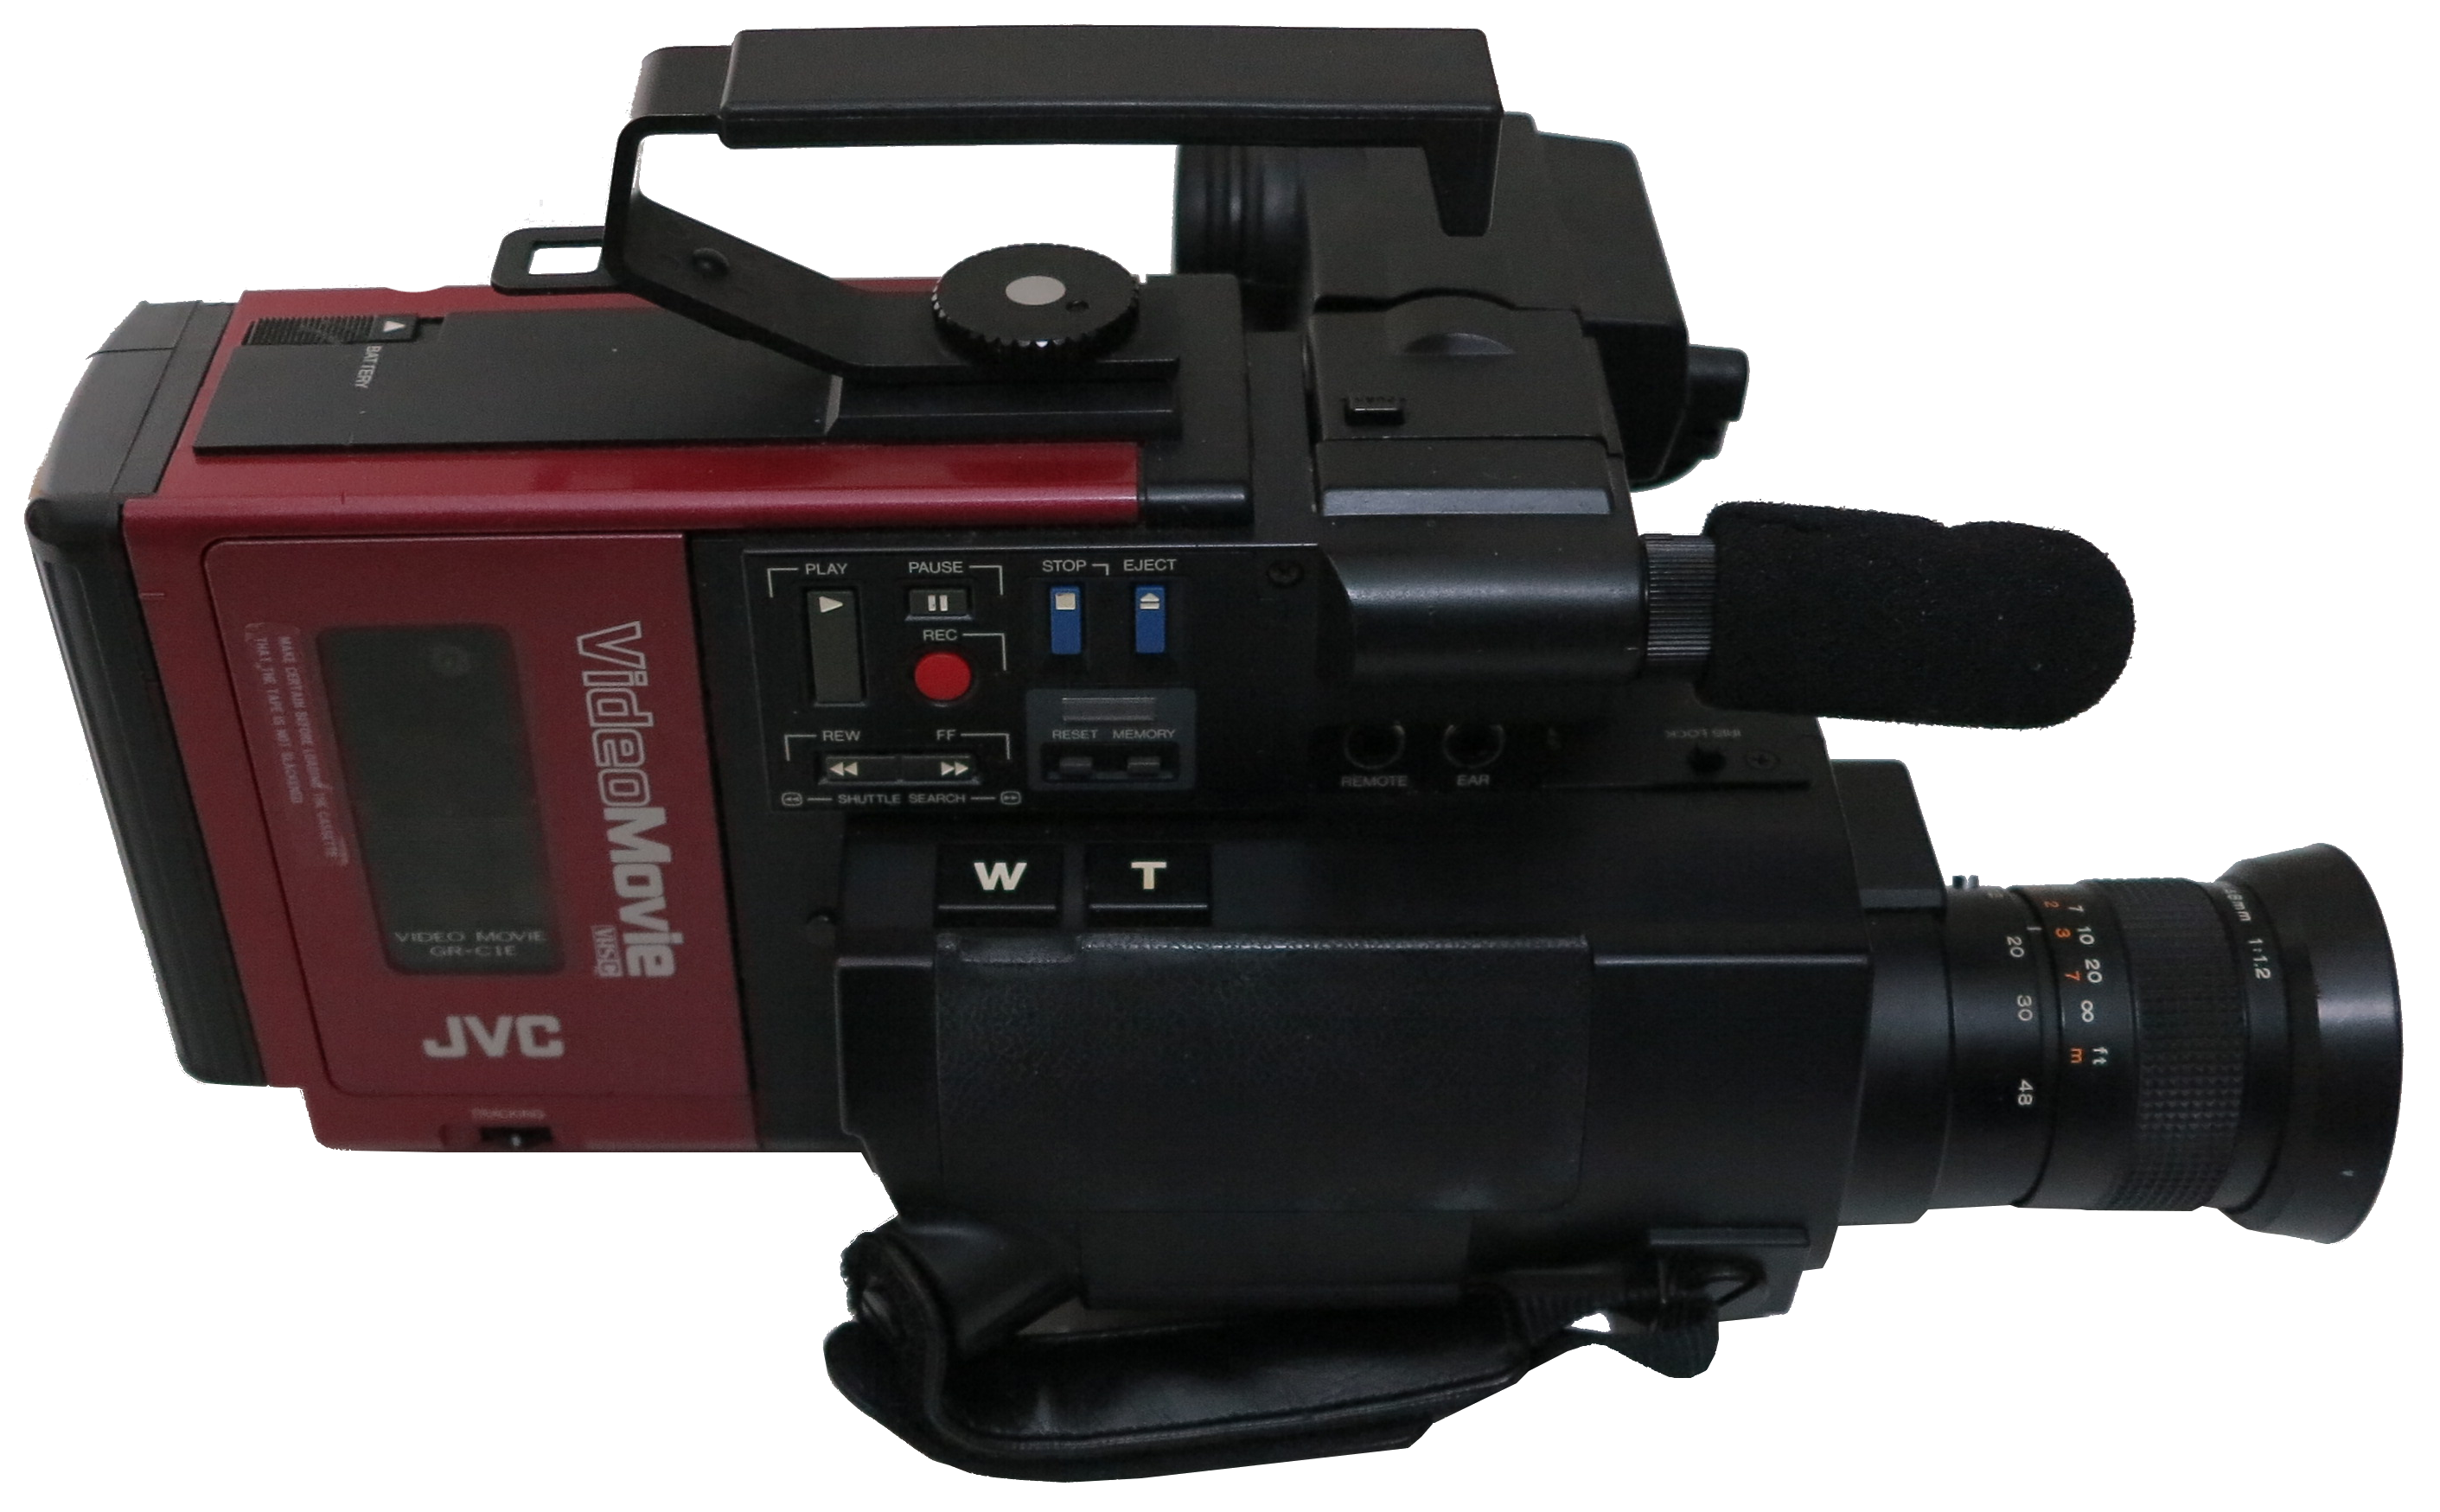 JVC GR-C1